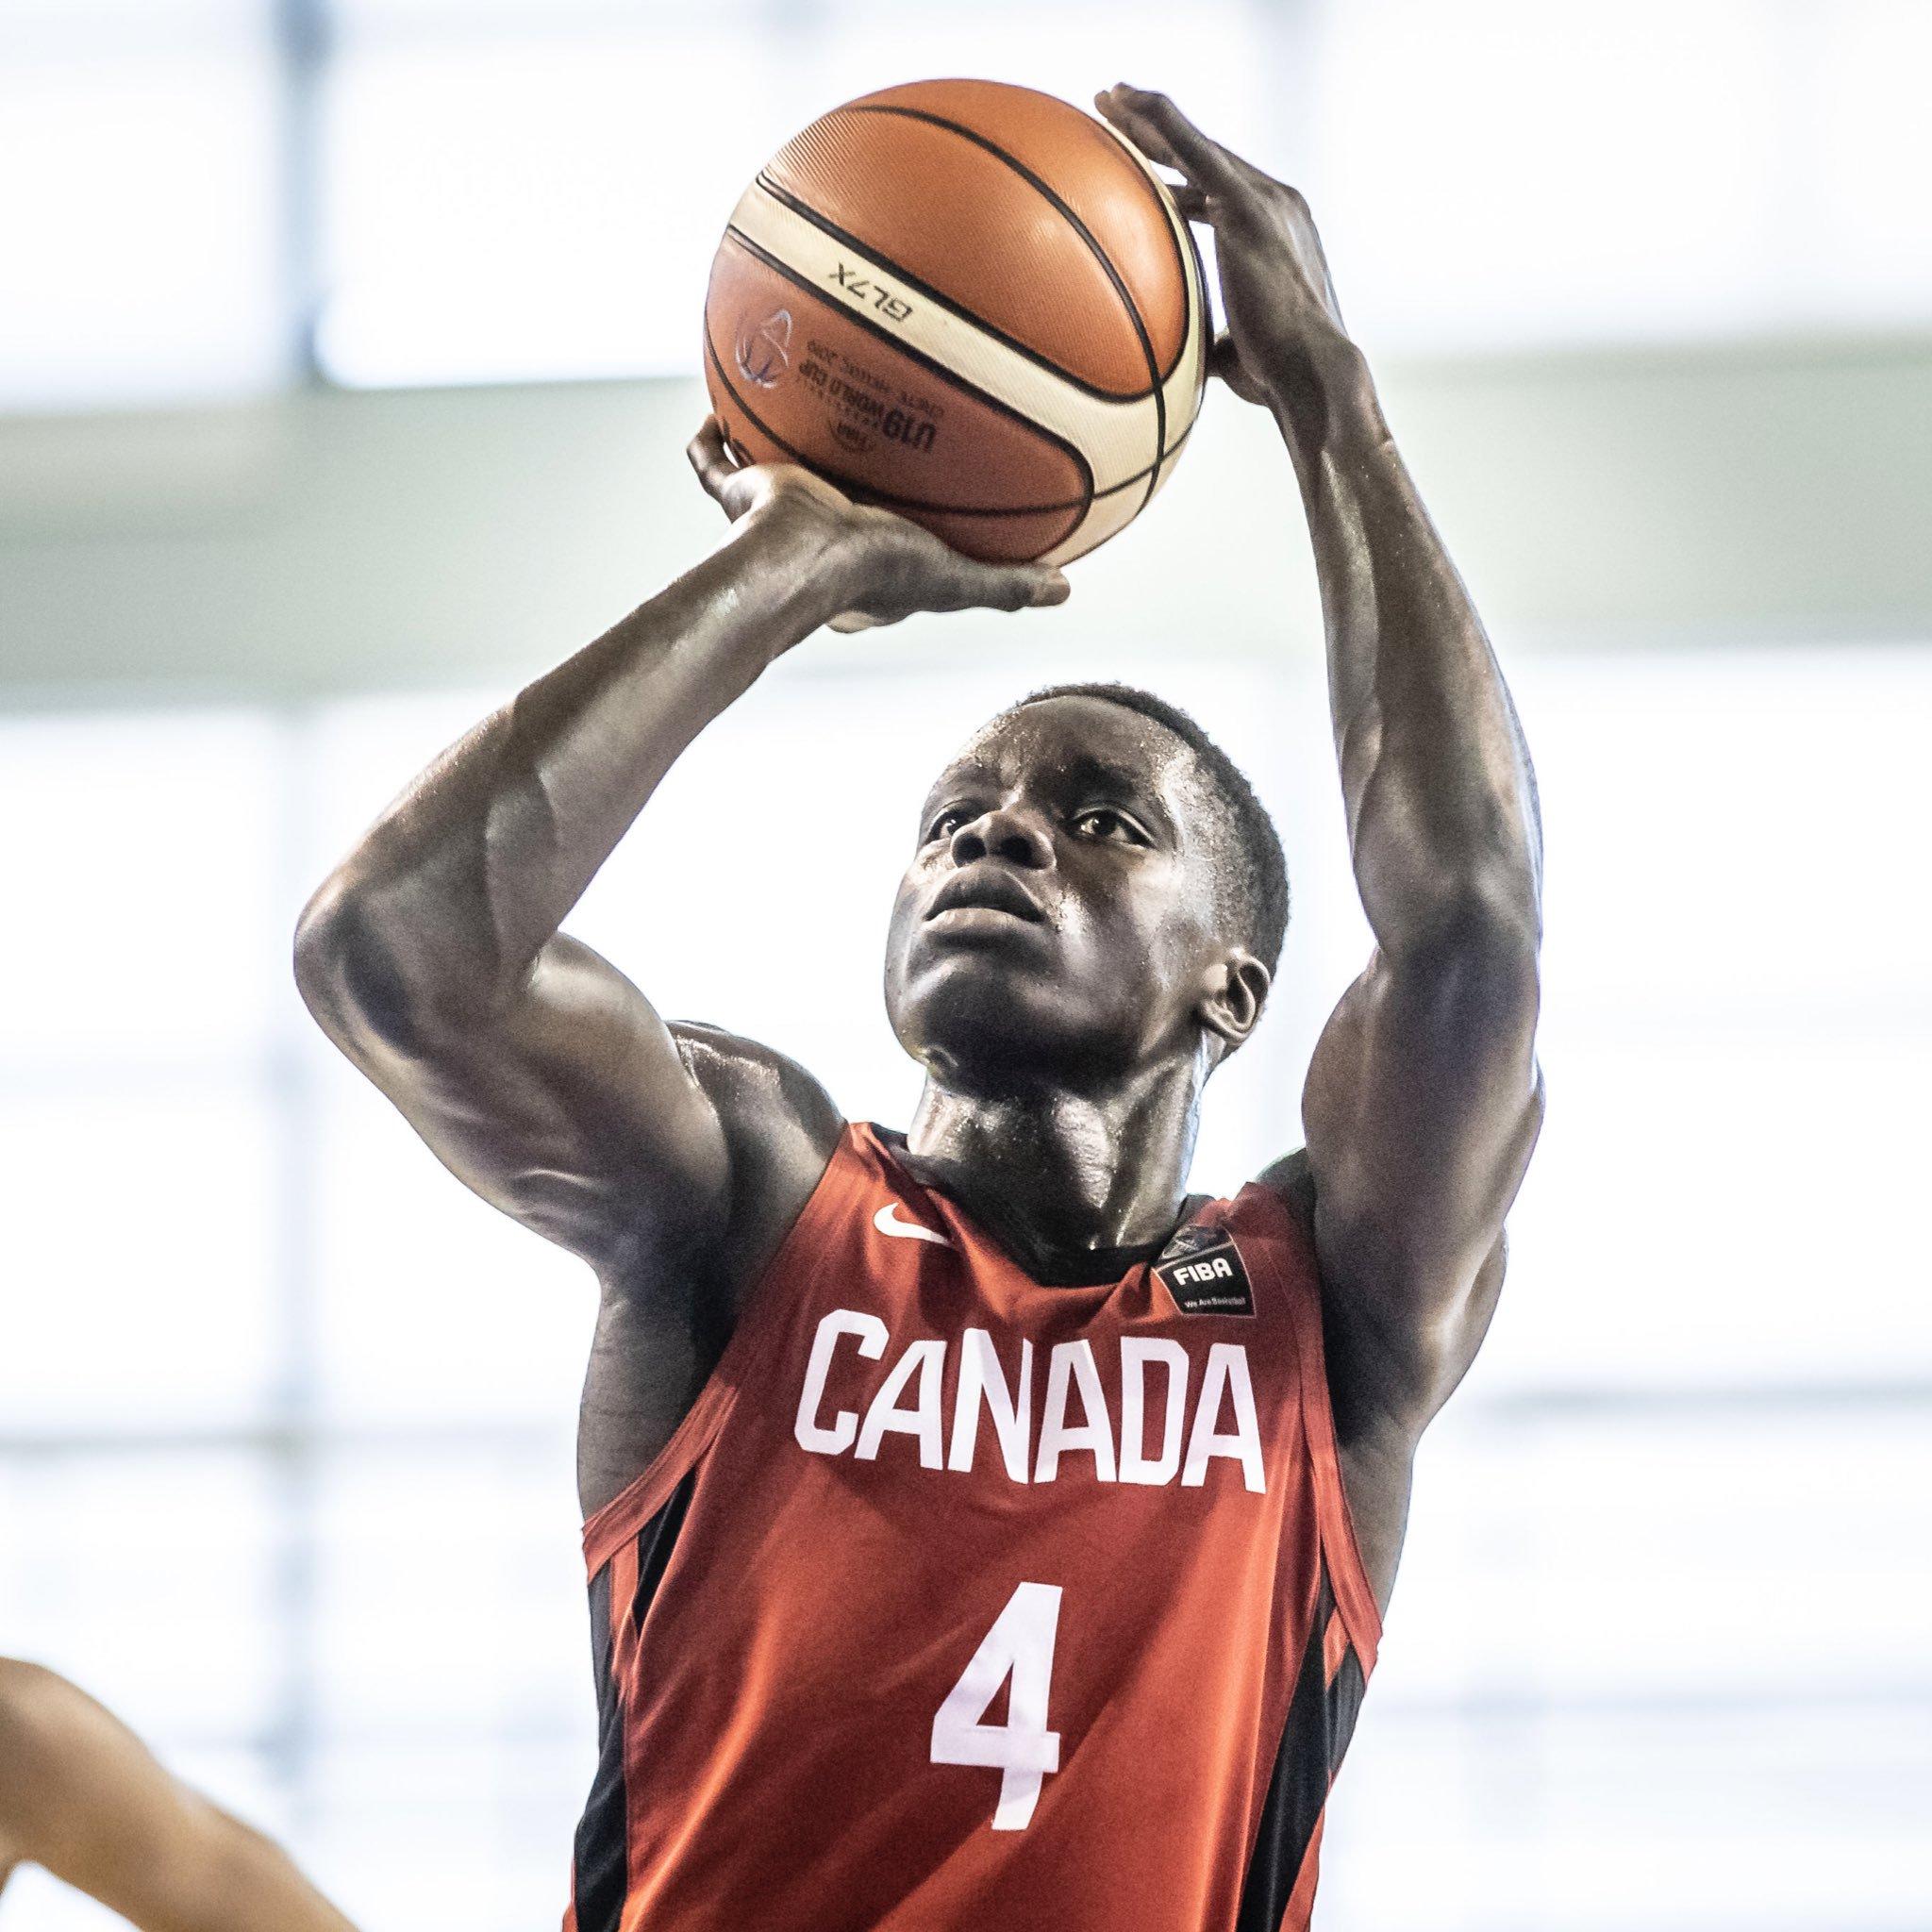 Canada defeats Australia to open the FIBA U19 Basketball World Cup 2019